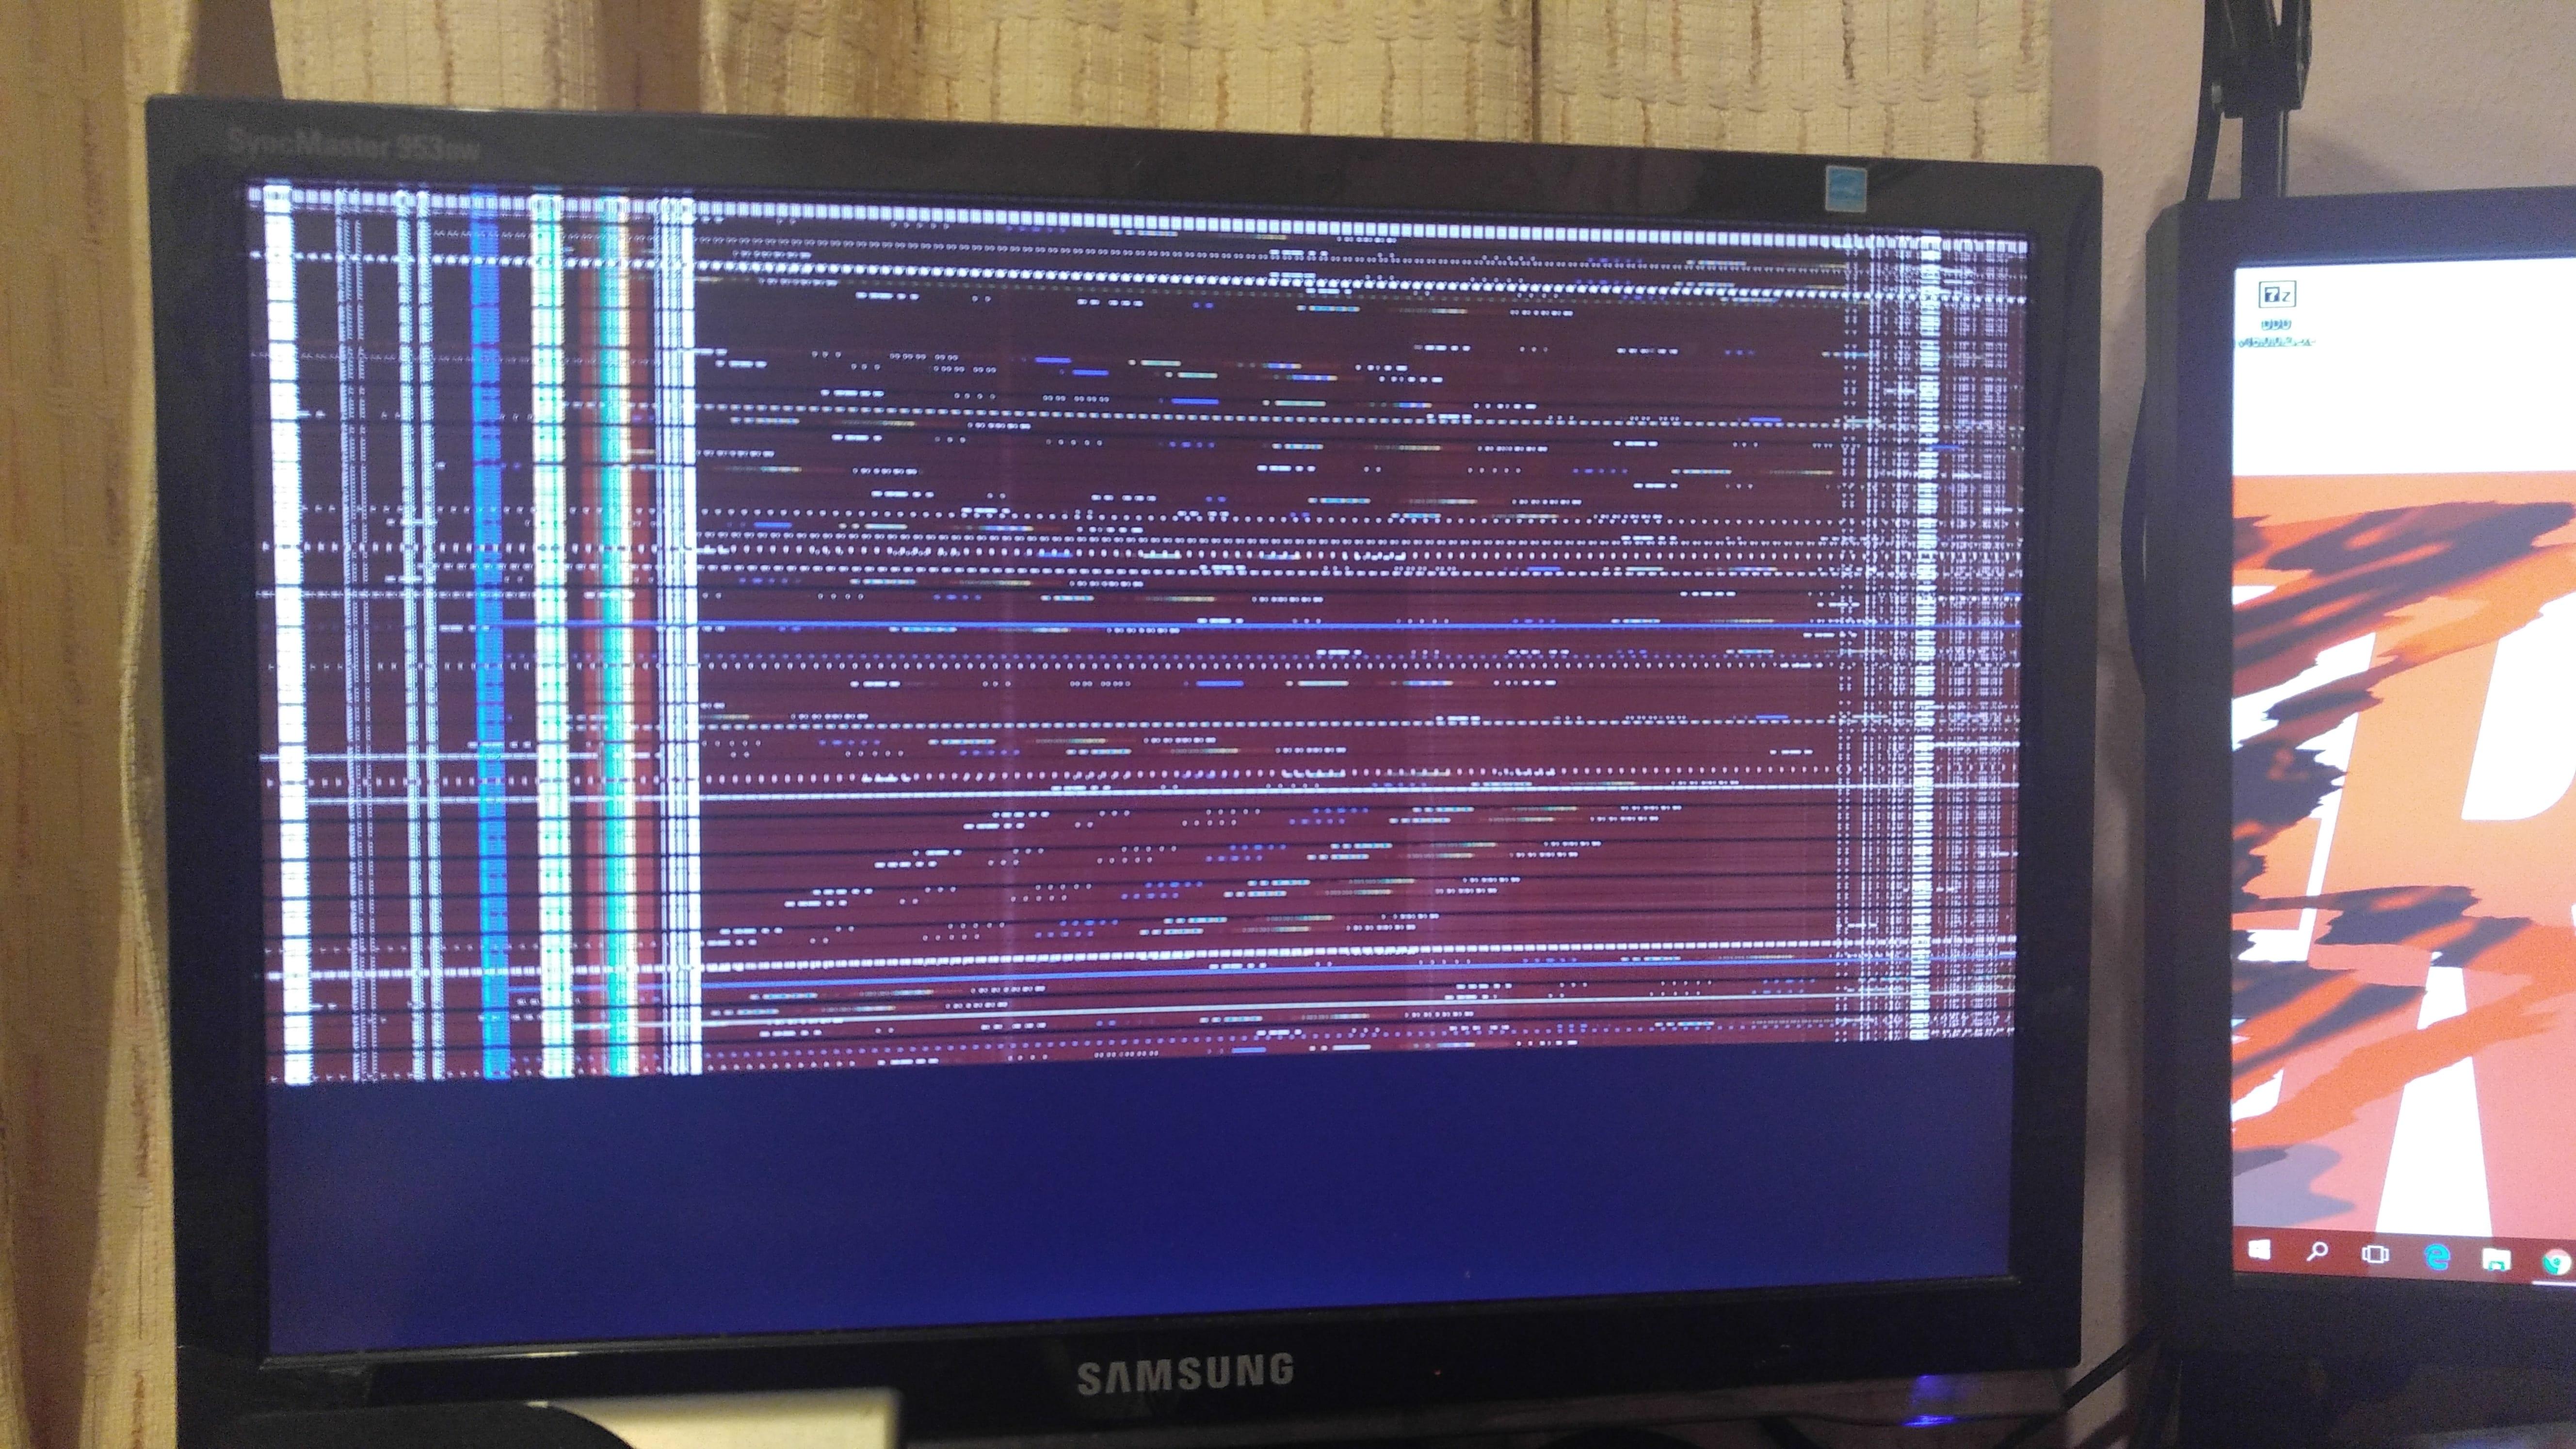 erratic flashing/corrupted display signal xfx r9 280 black edition